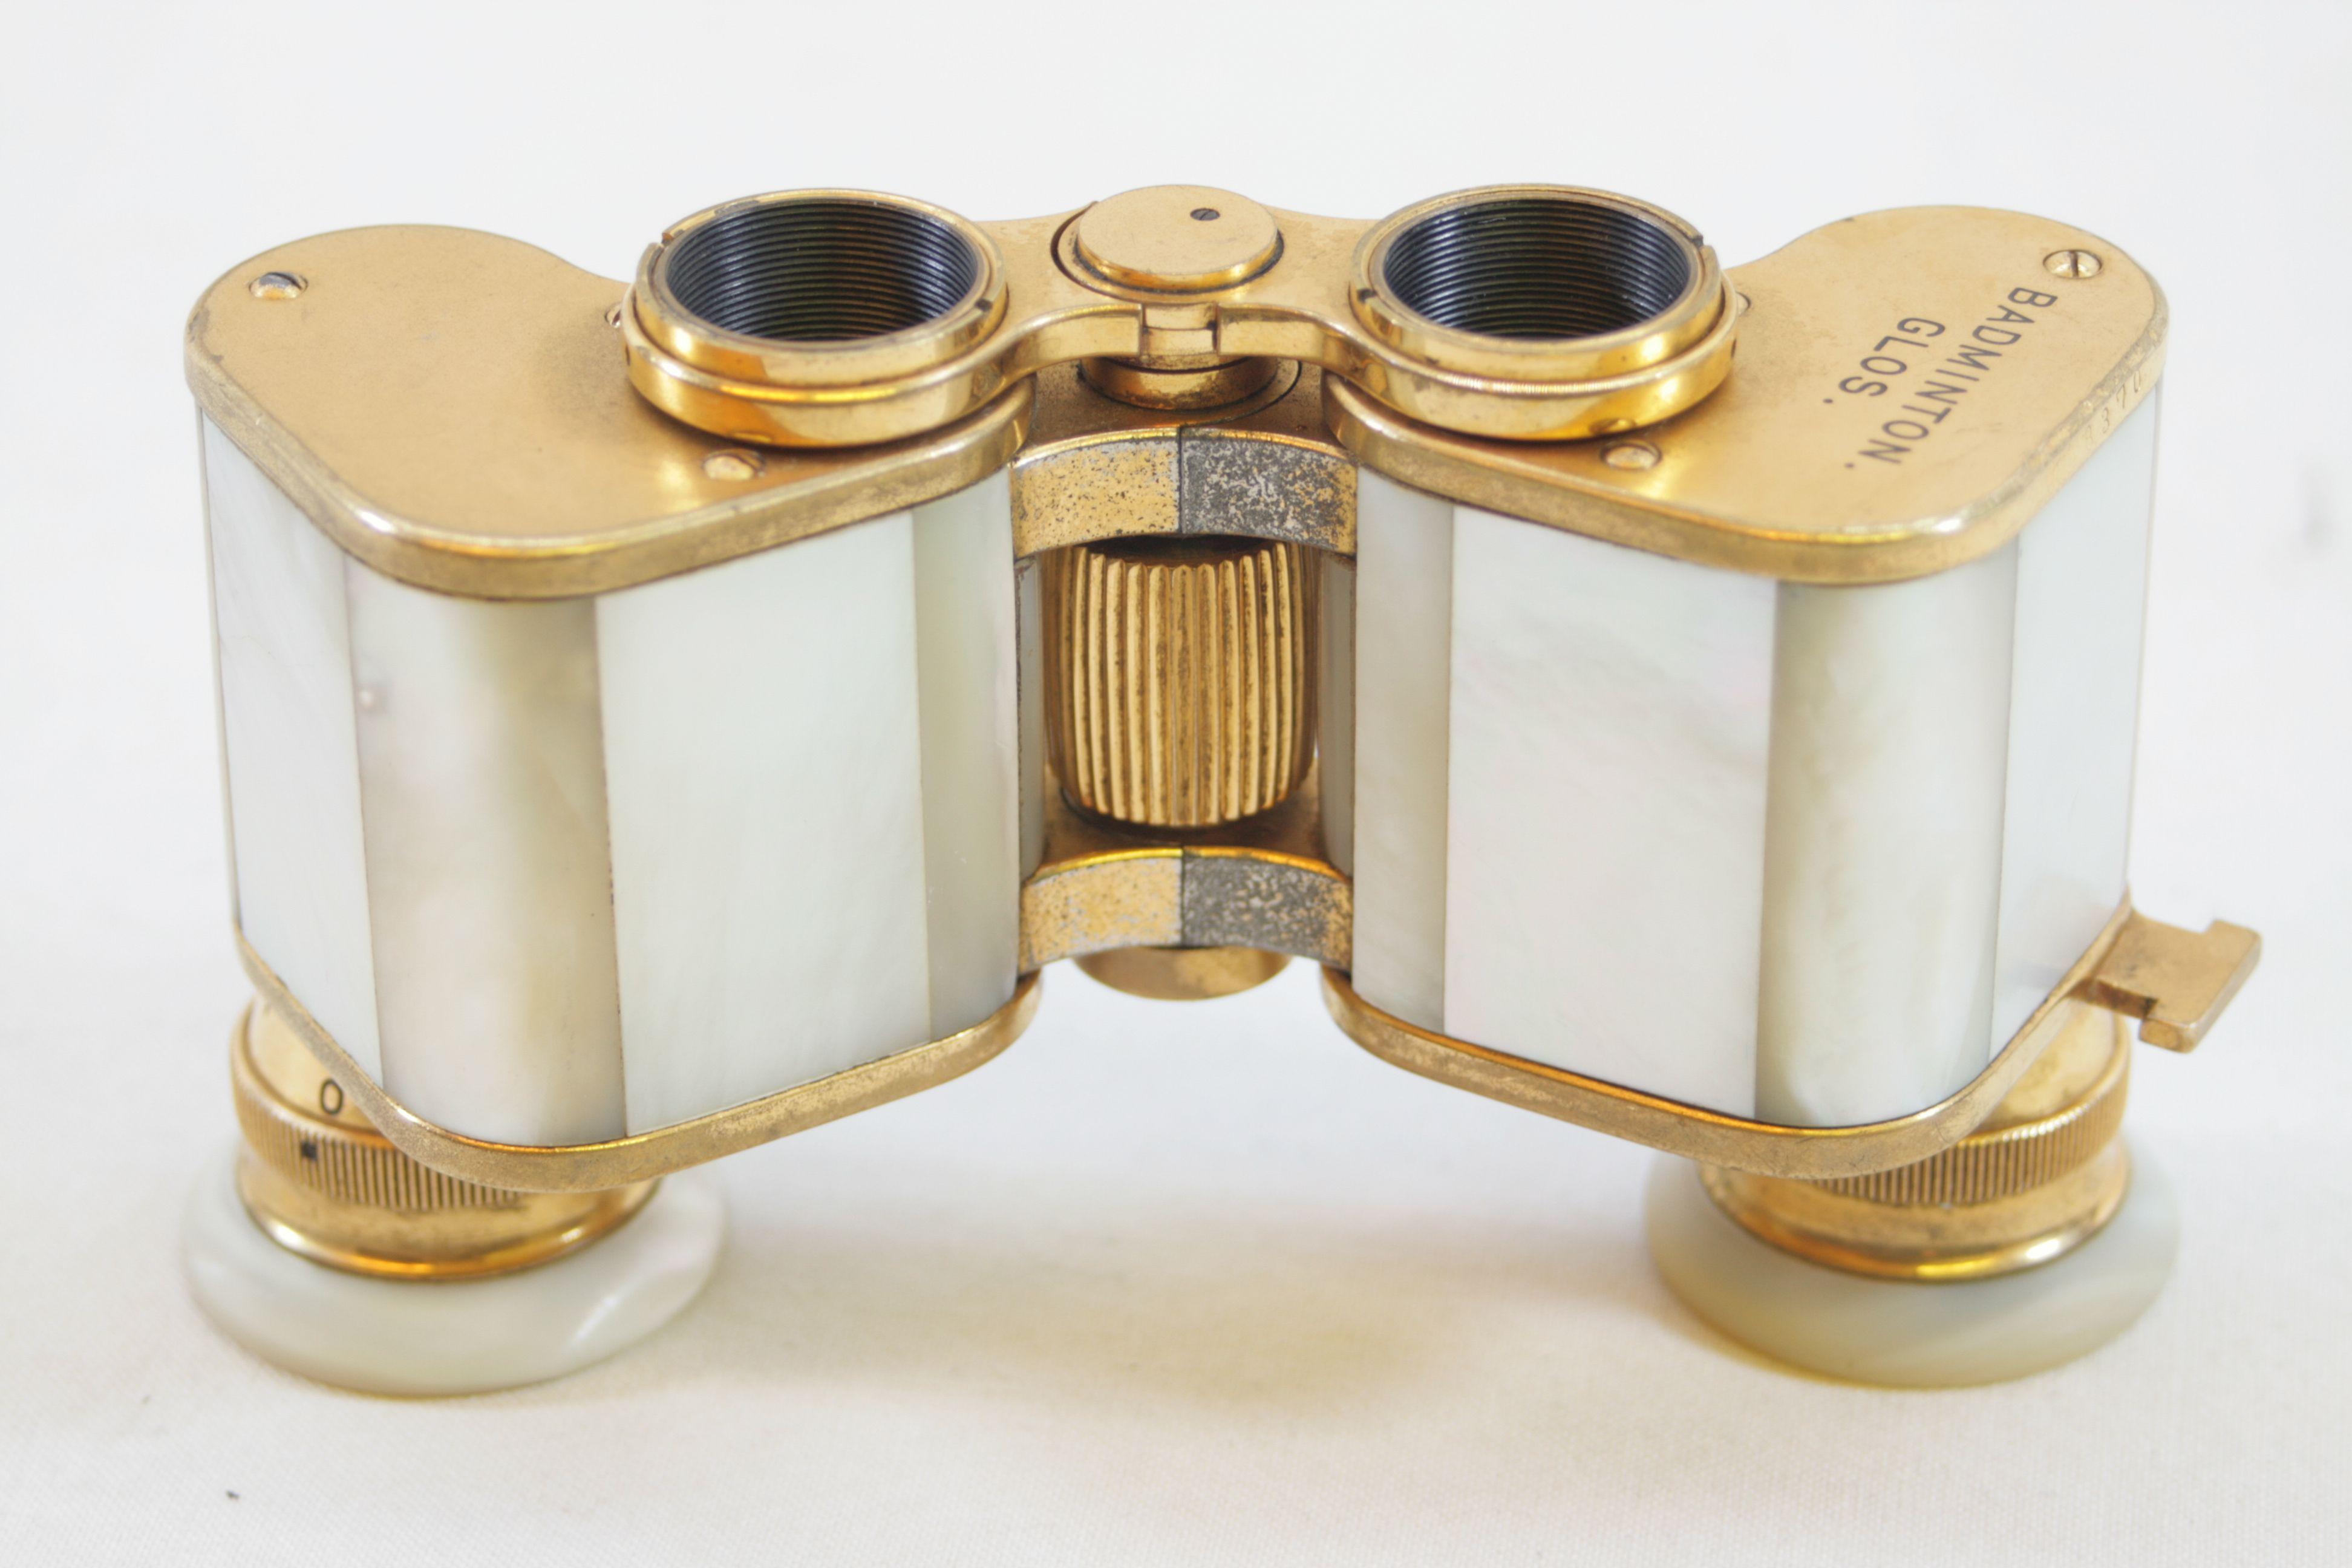 dd242aaa2f4 Open Full-Size Image. Carl Zeiss Jena Teleater 3 x 13.5 Prismatic Pearl  Opera Glasses   Binoculars 7